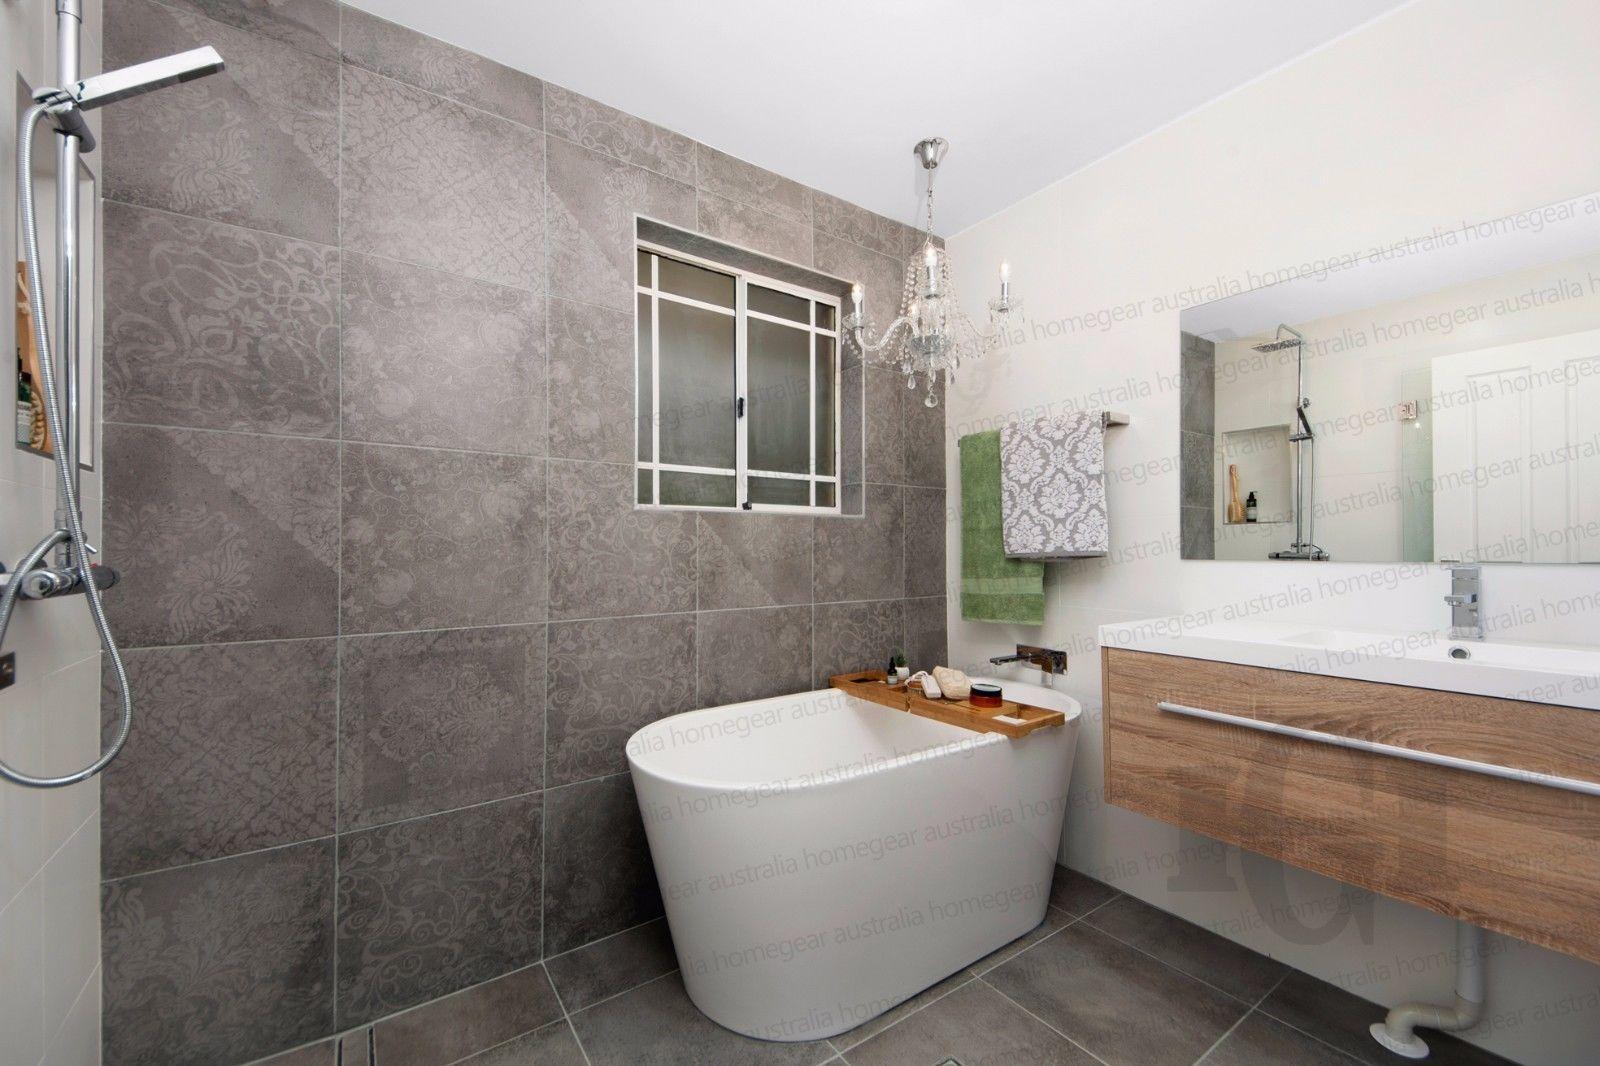 1340mm Oval Freestanding Acrylic Bath Tub With Side Waste 1340x675x560 Homegear Australia